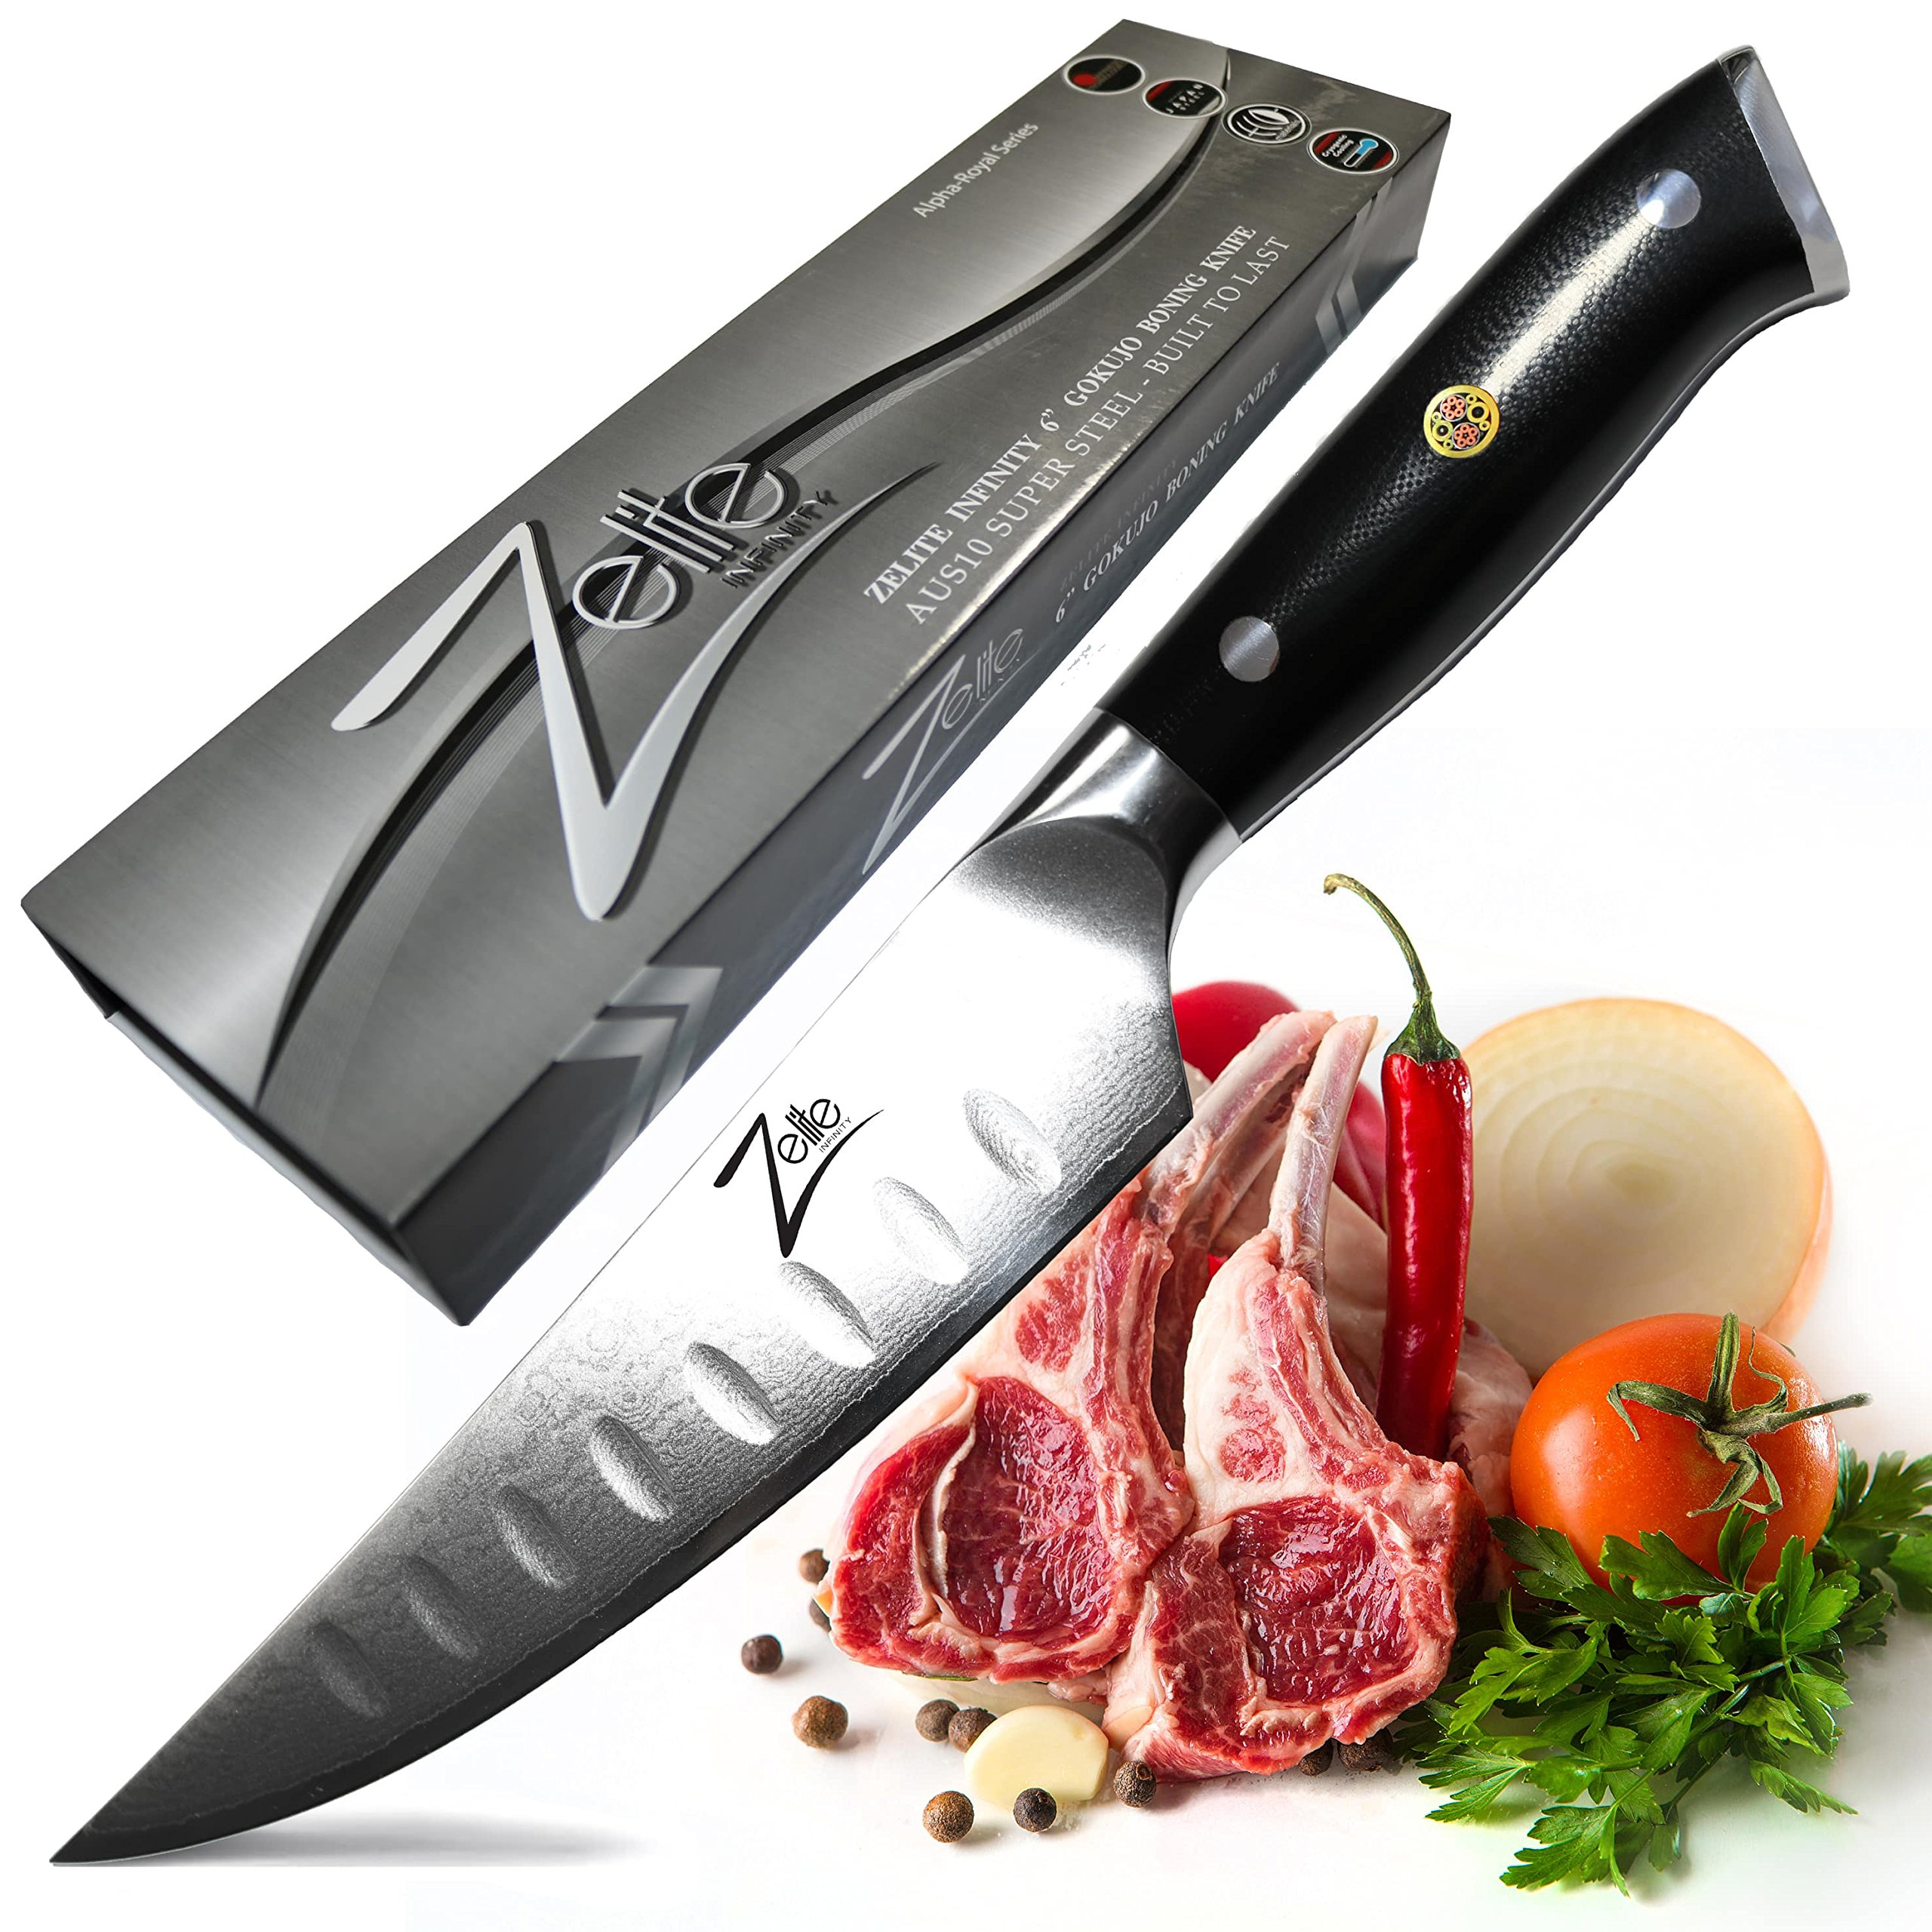 ZELITE INFINITY Boning Knife 6 inch - Alpha-Royal Series -Best Quality Japanese AUS10 Super Steel 67 Layer Damascus -Razor Sharp, Curved Granton Edge, Versatile Deboning Knives Great for Delicate Work